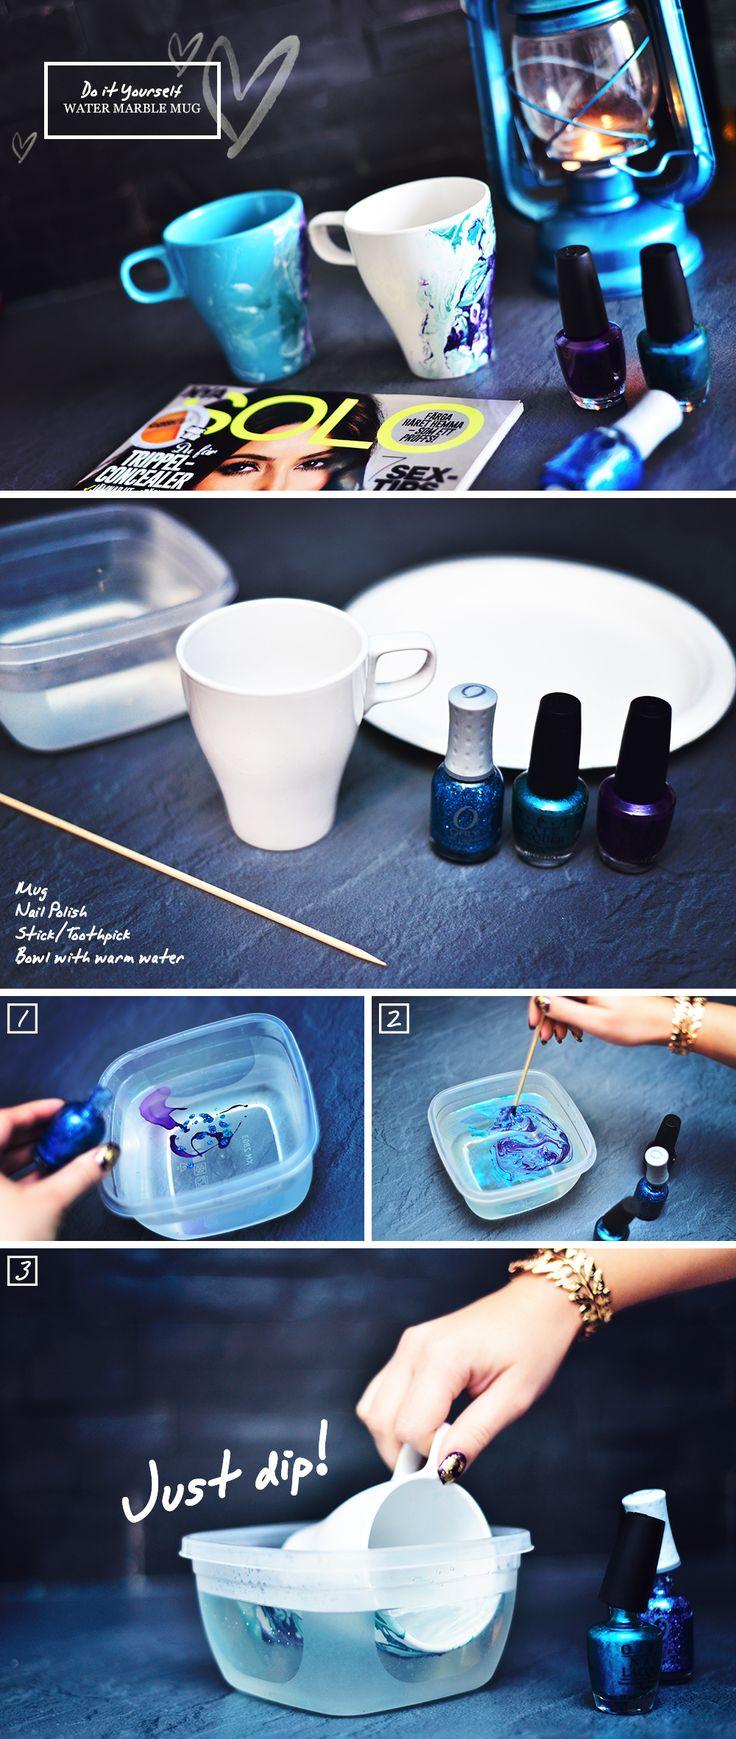 DIY - Water Marble Mug http://www.adaras.se/diy-water-marble-mugg/ #diy #adaras #adarasblogazine